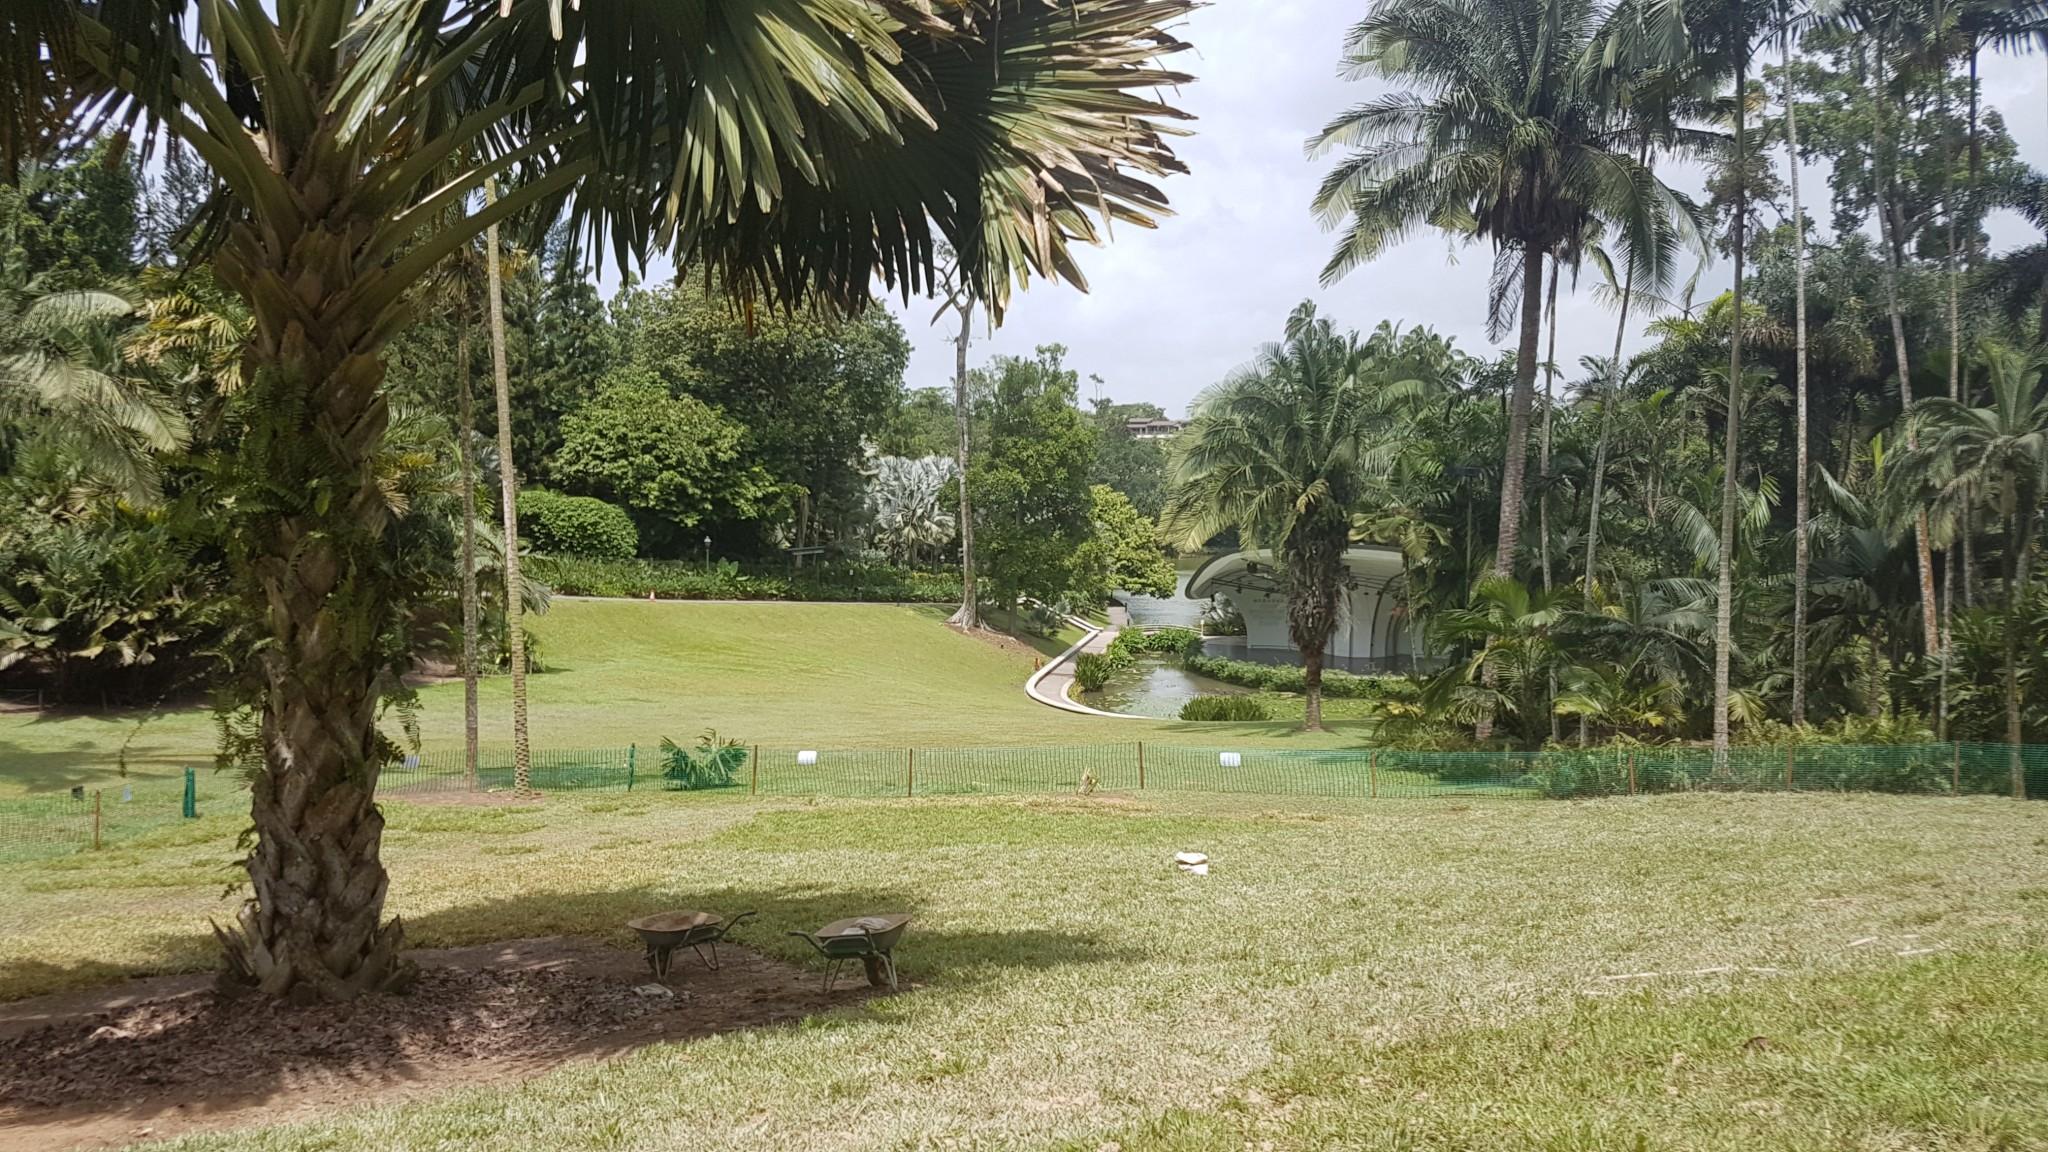 Singapore, Botanic Gardens, Foliage Garden, Backpackjunkies